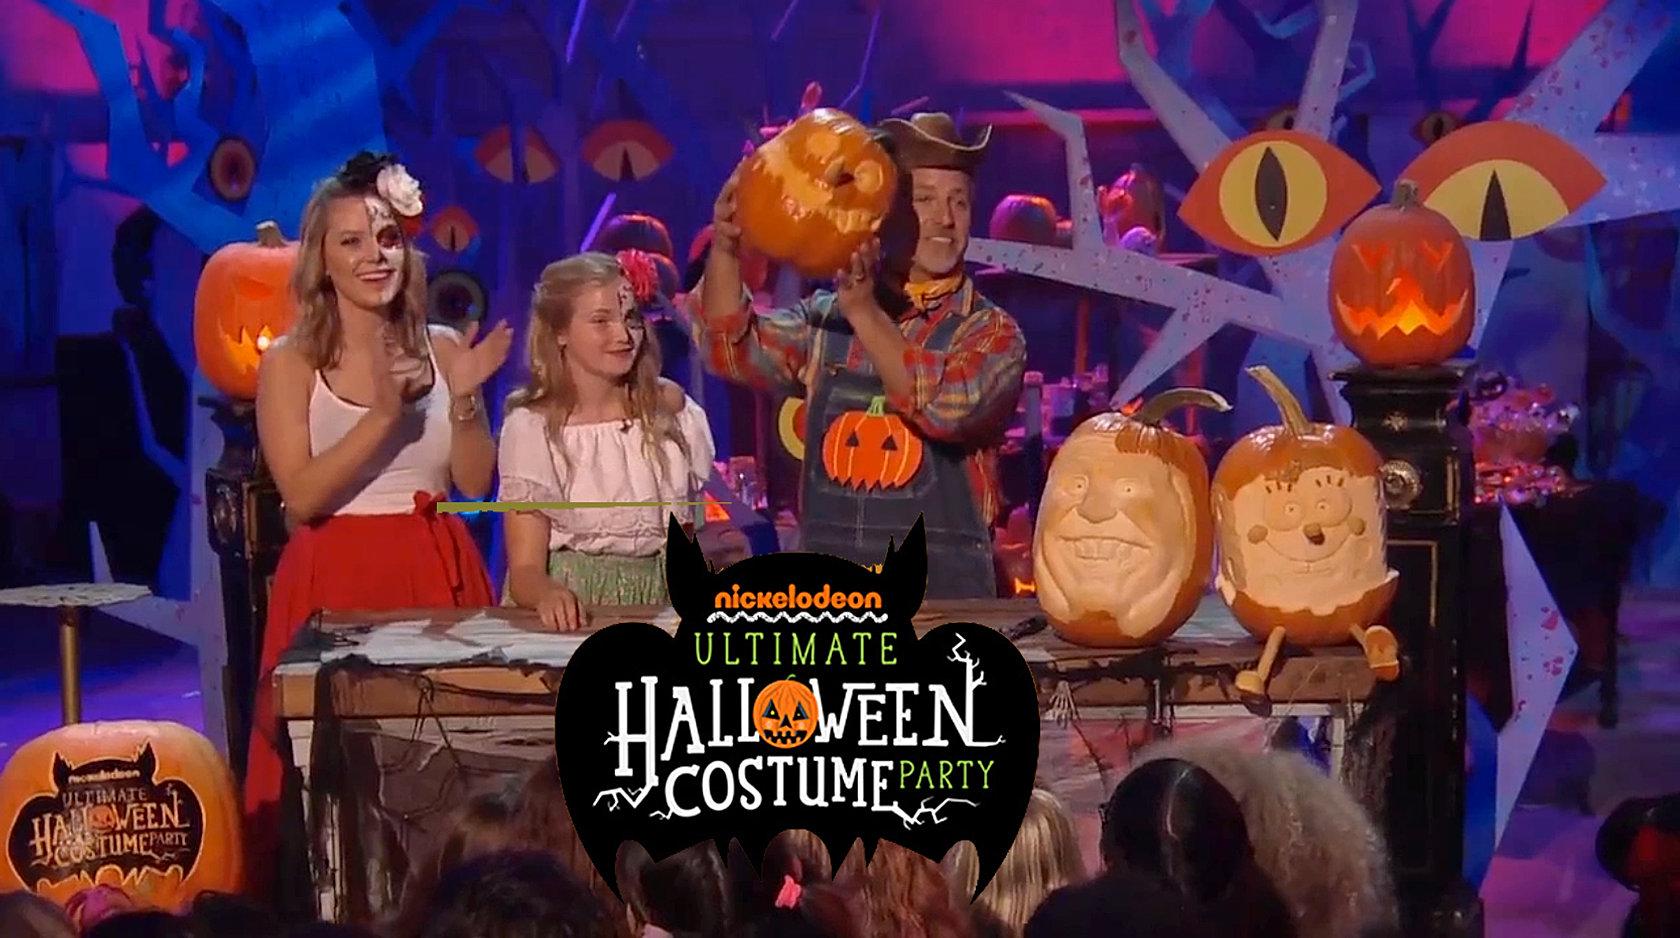 Professional Pumpkin Carving & Film Artist